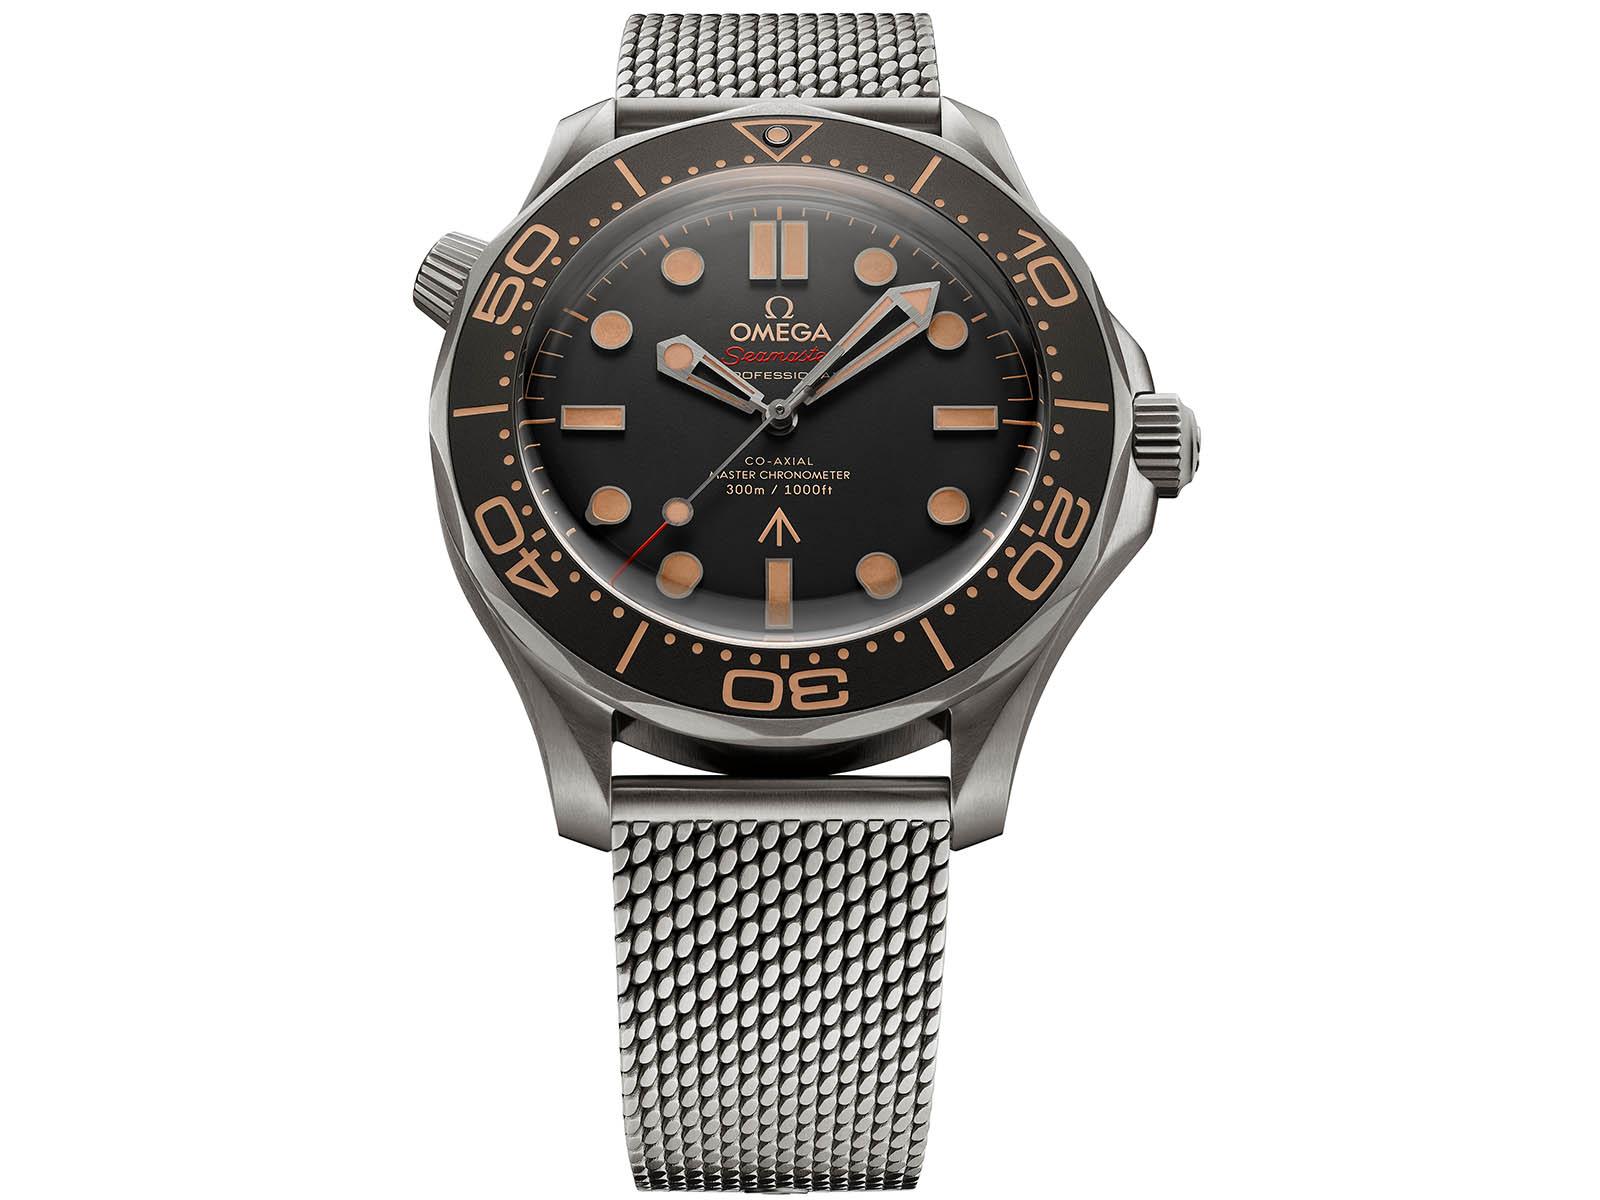 210-90-42-20-01-001-omega-seamaster-diver-300m-007-edition-4.jpg